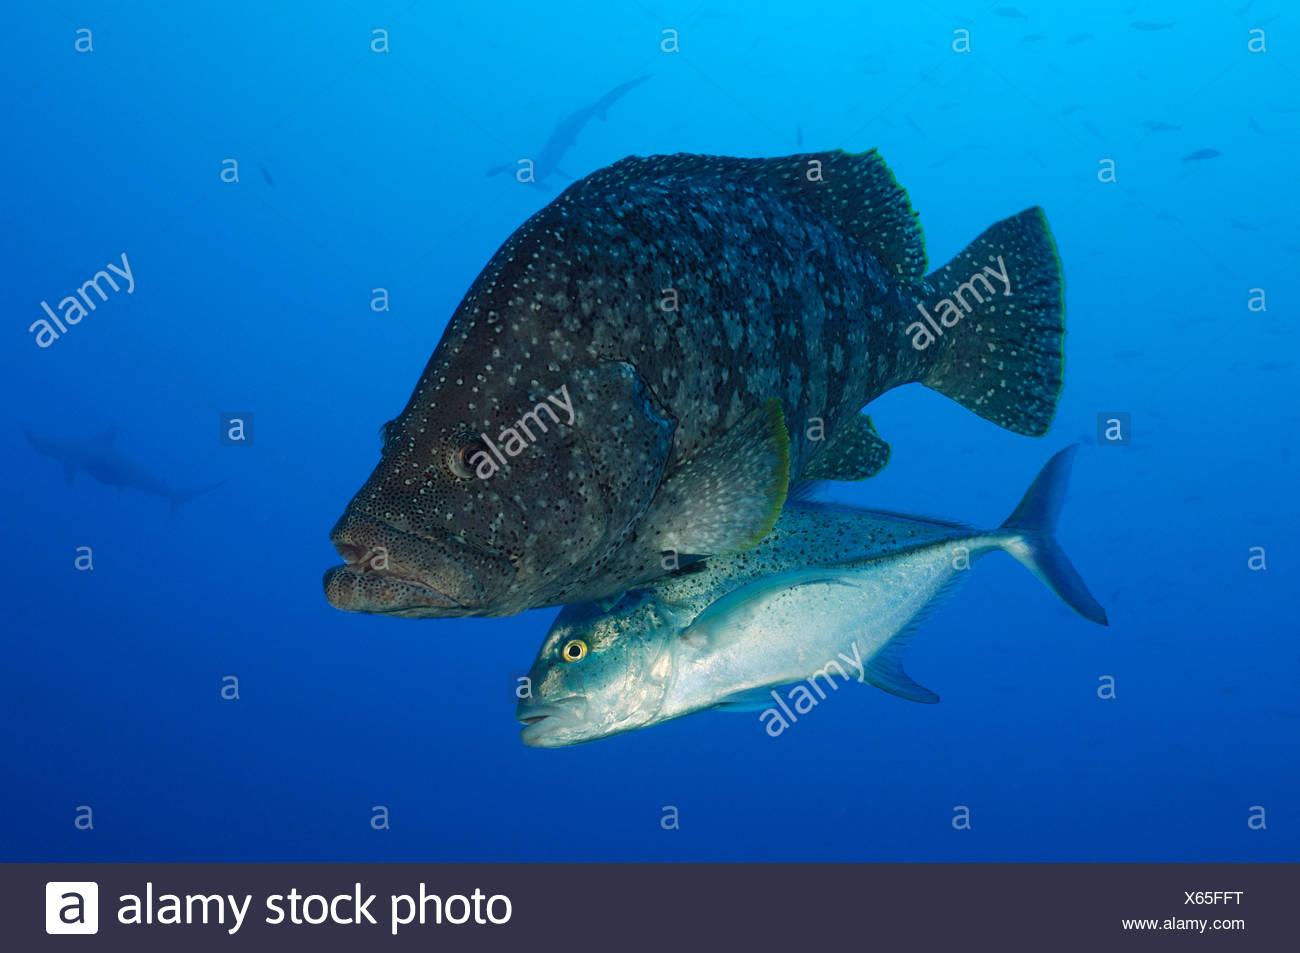 Leather Bass accompanied by Bigeye Trevally, Dermatolepis dermatolepis, Caranx sexfasciatus, Revillagigedo Islands, Mexico - Stock Image